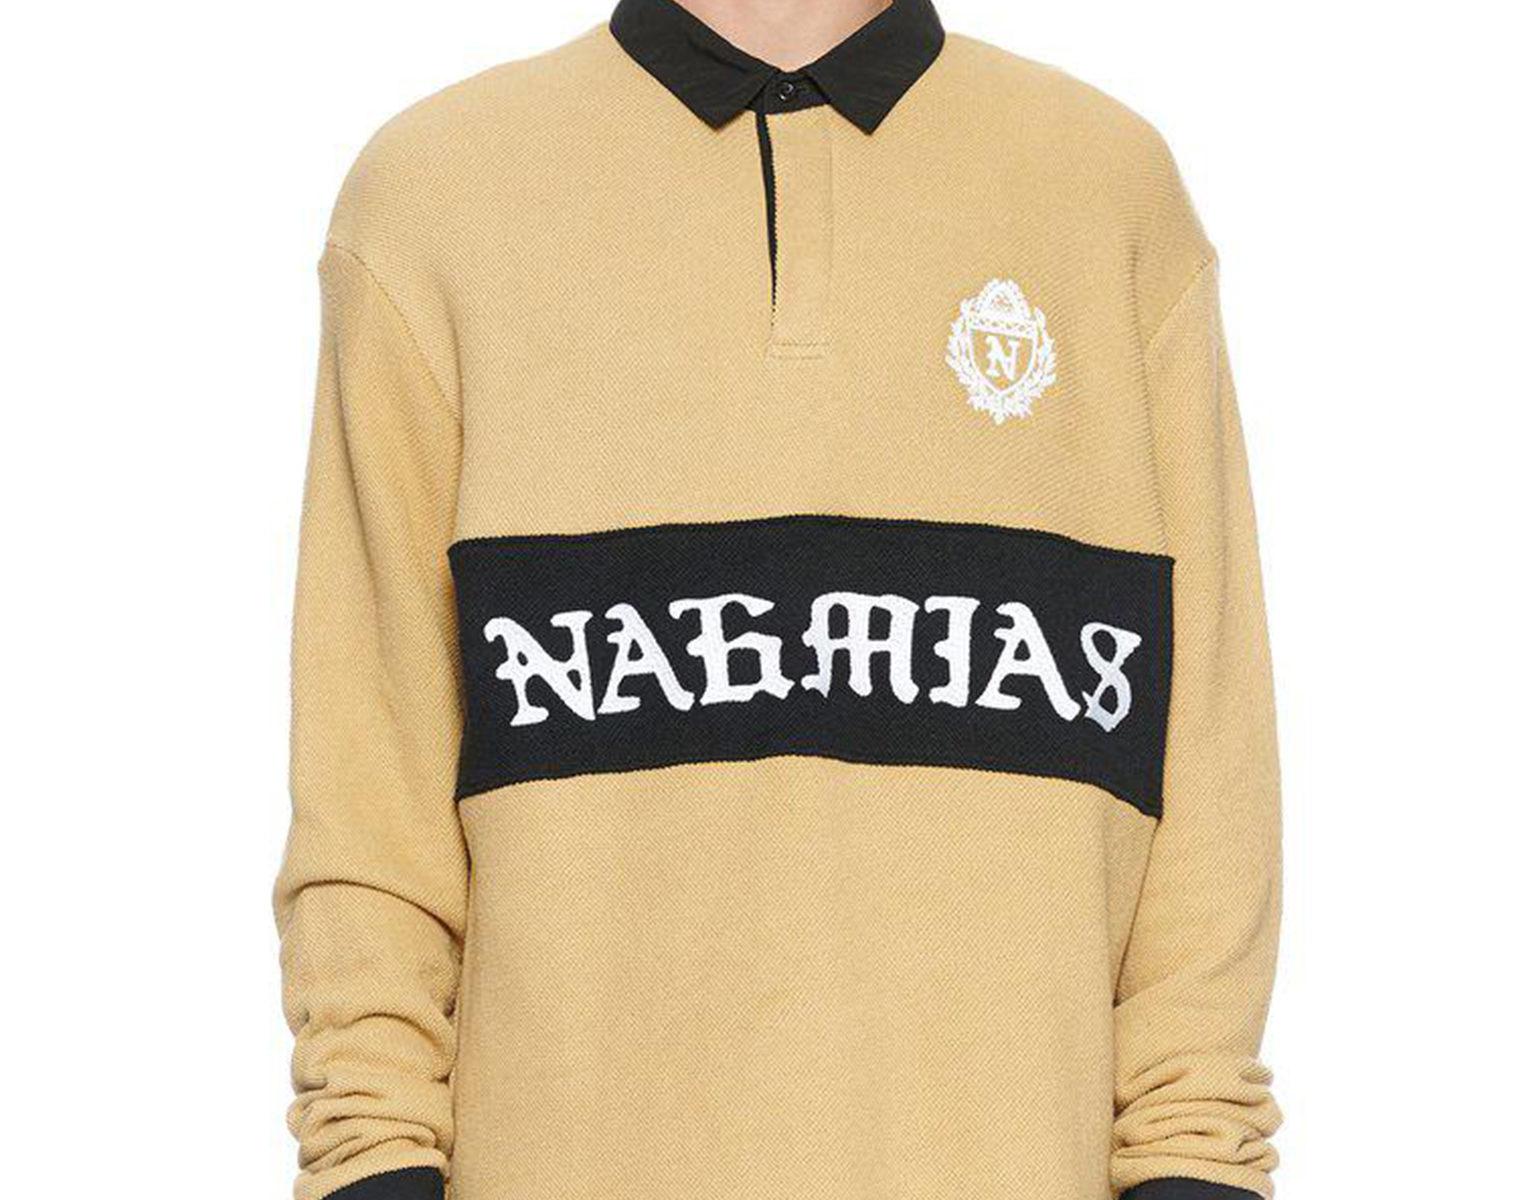 NAHMIAS Rugby Shirt 1